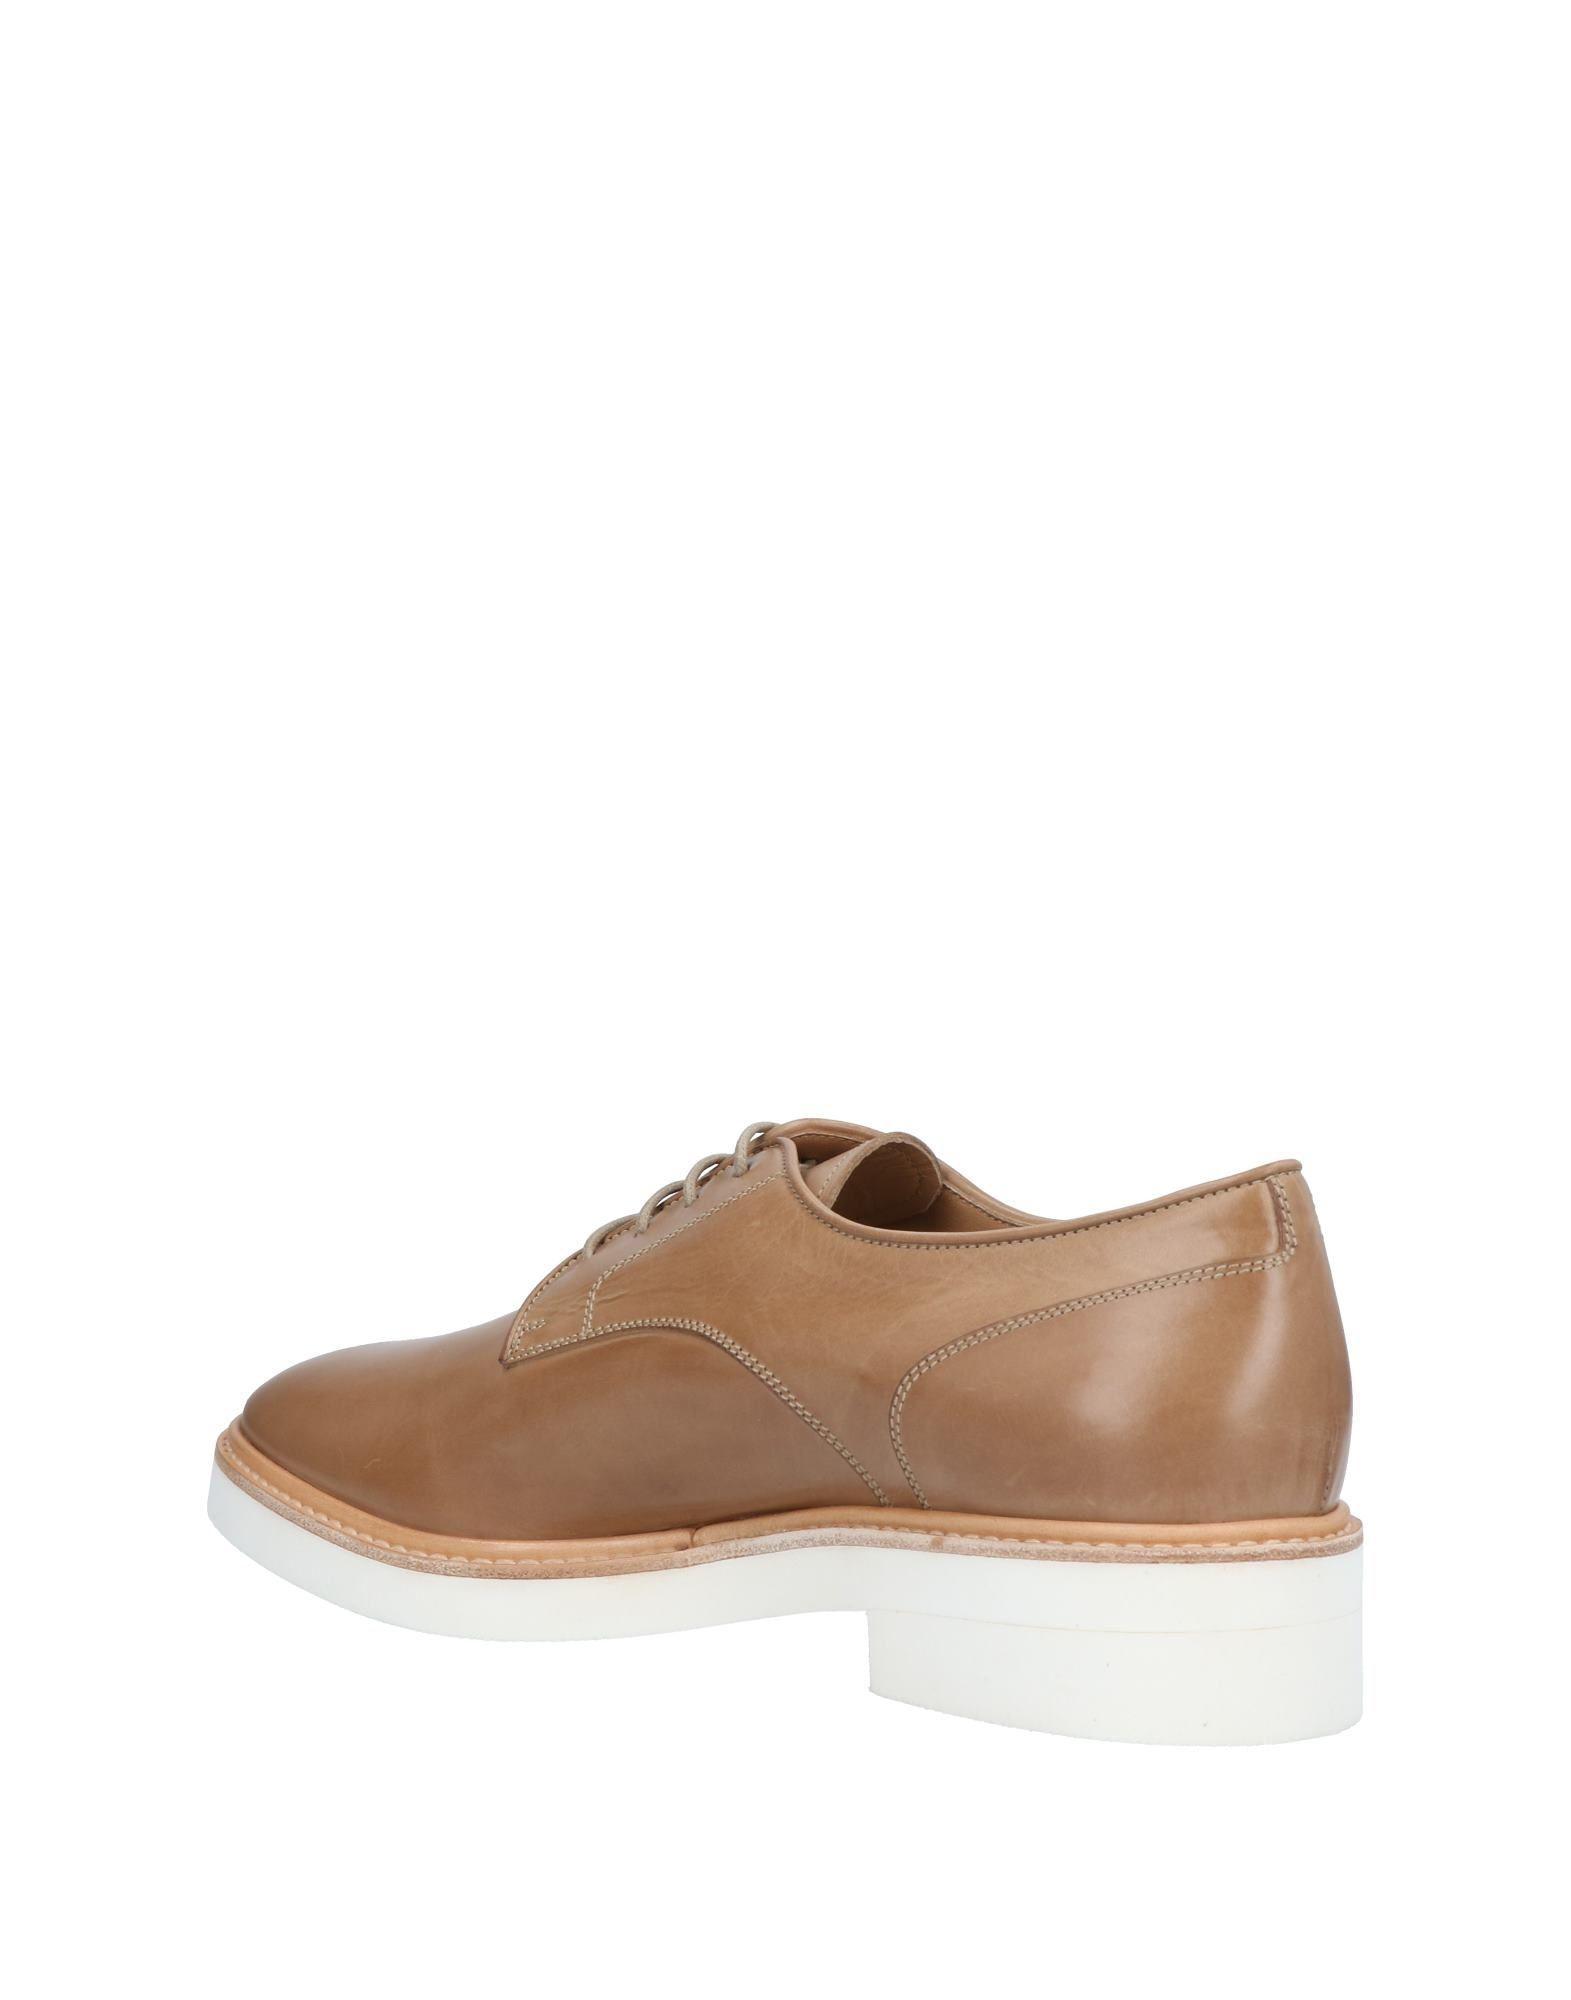 Sartore Chaussures À Lacets o6D0RONJ